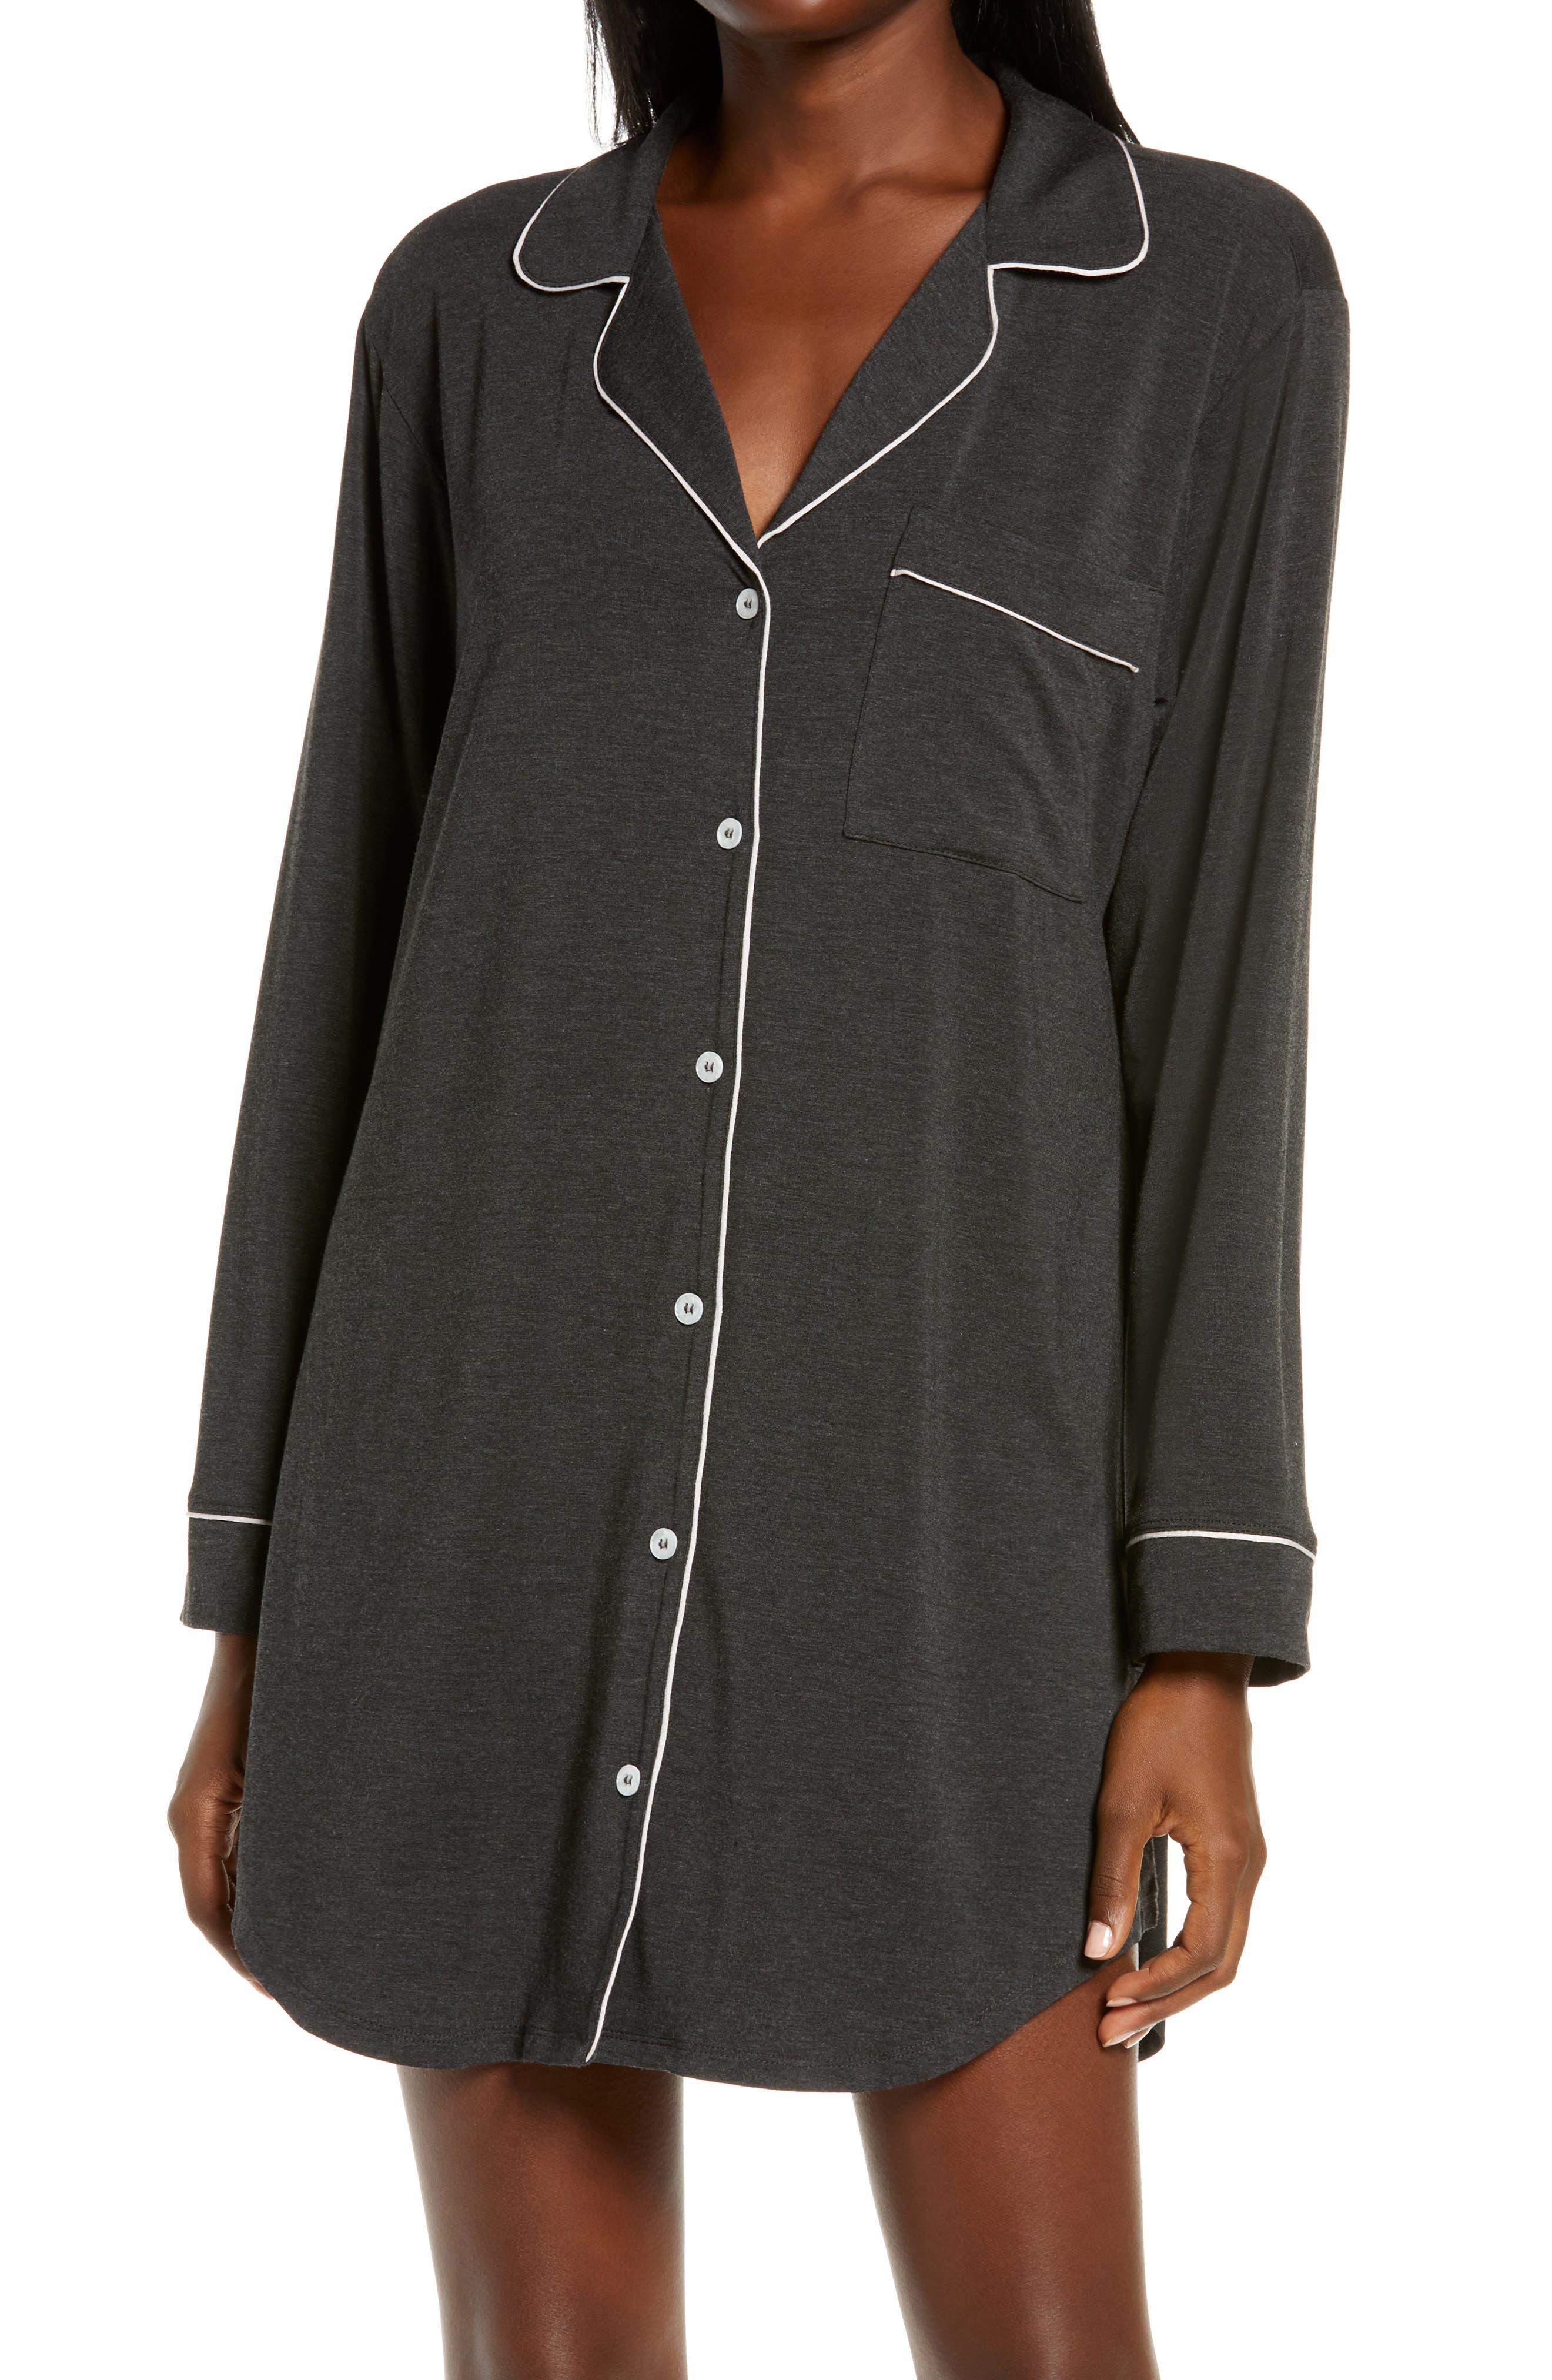 Gisele Stretch Jersey Sleep Shirt